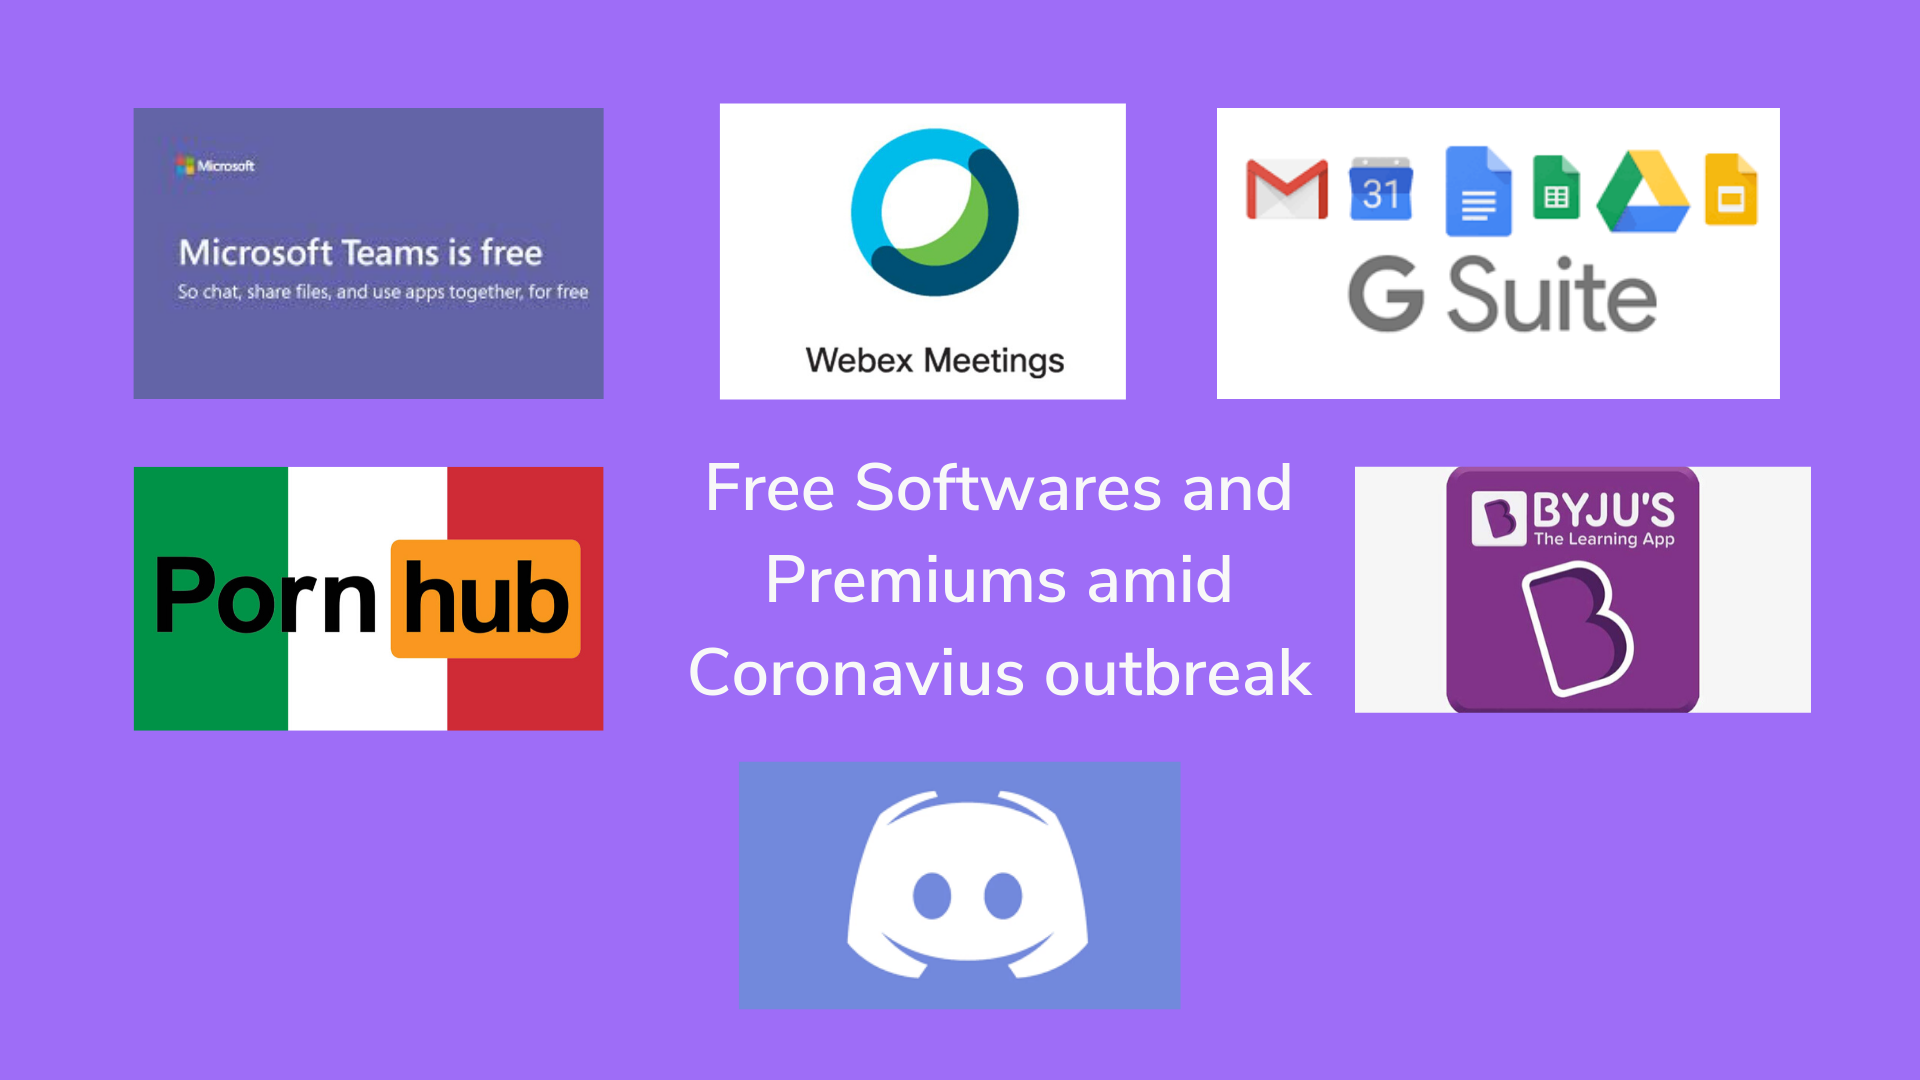 Many Softwares/Premiums go Free Due to Coronavirus Outbreak